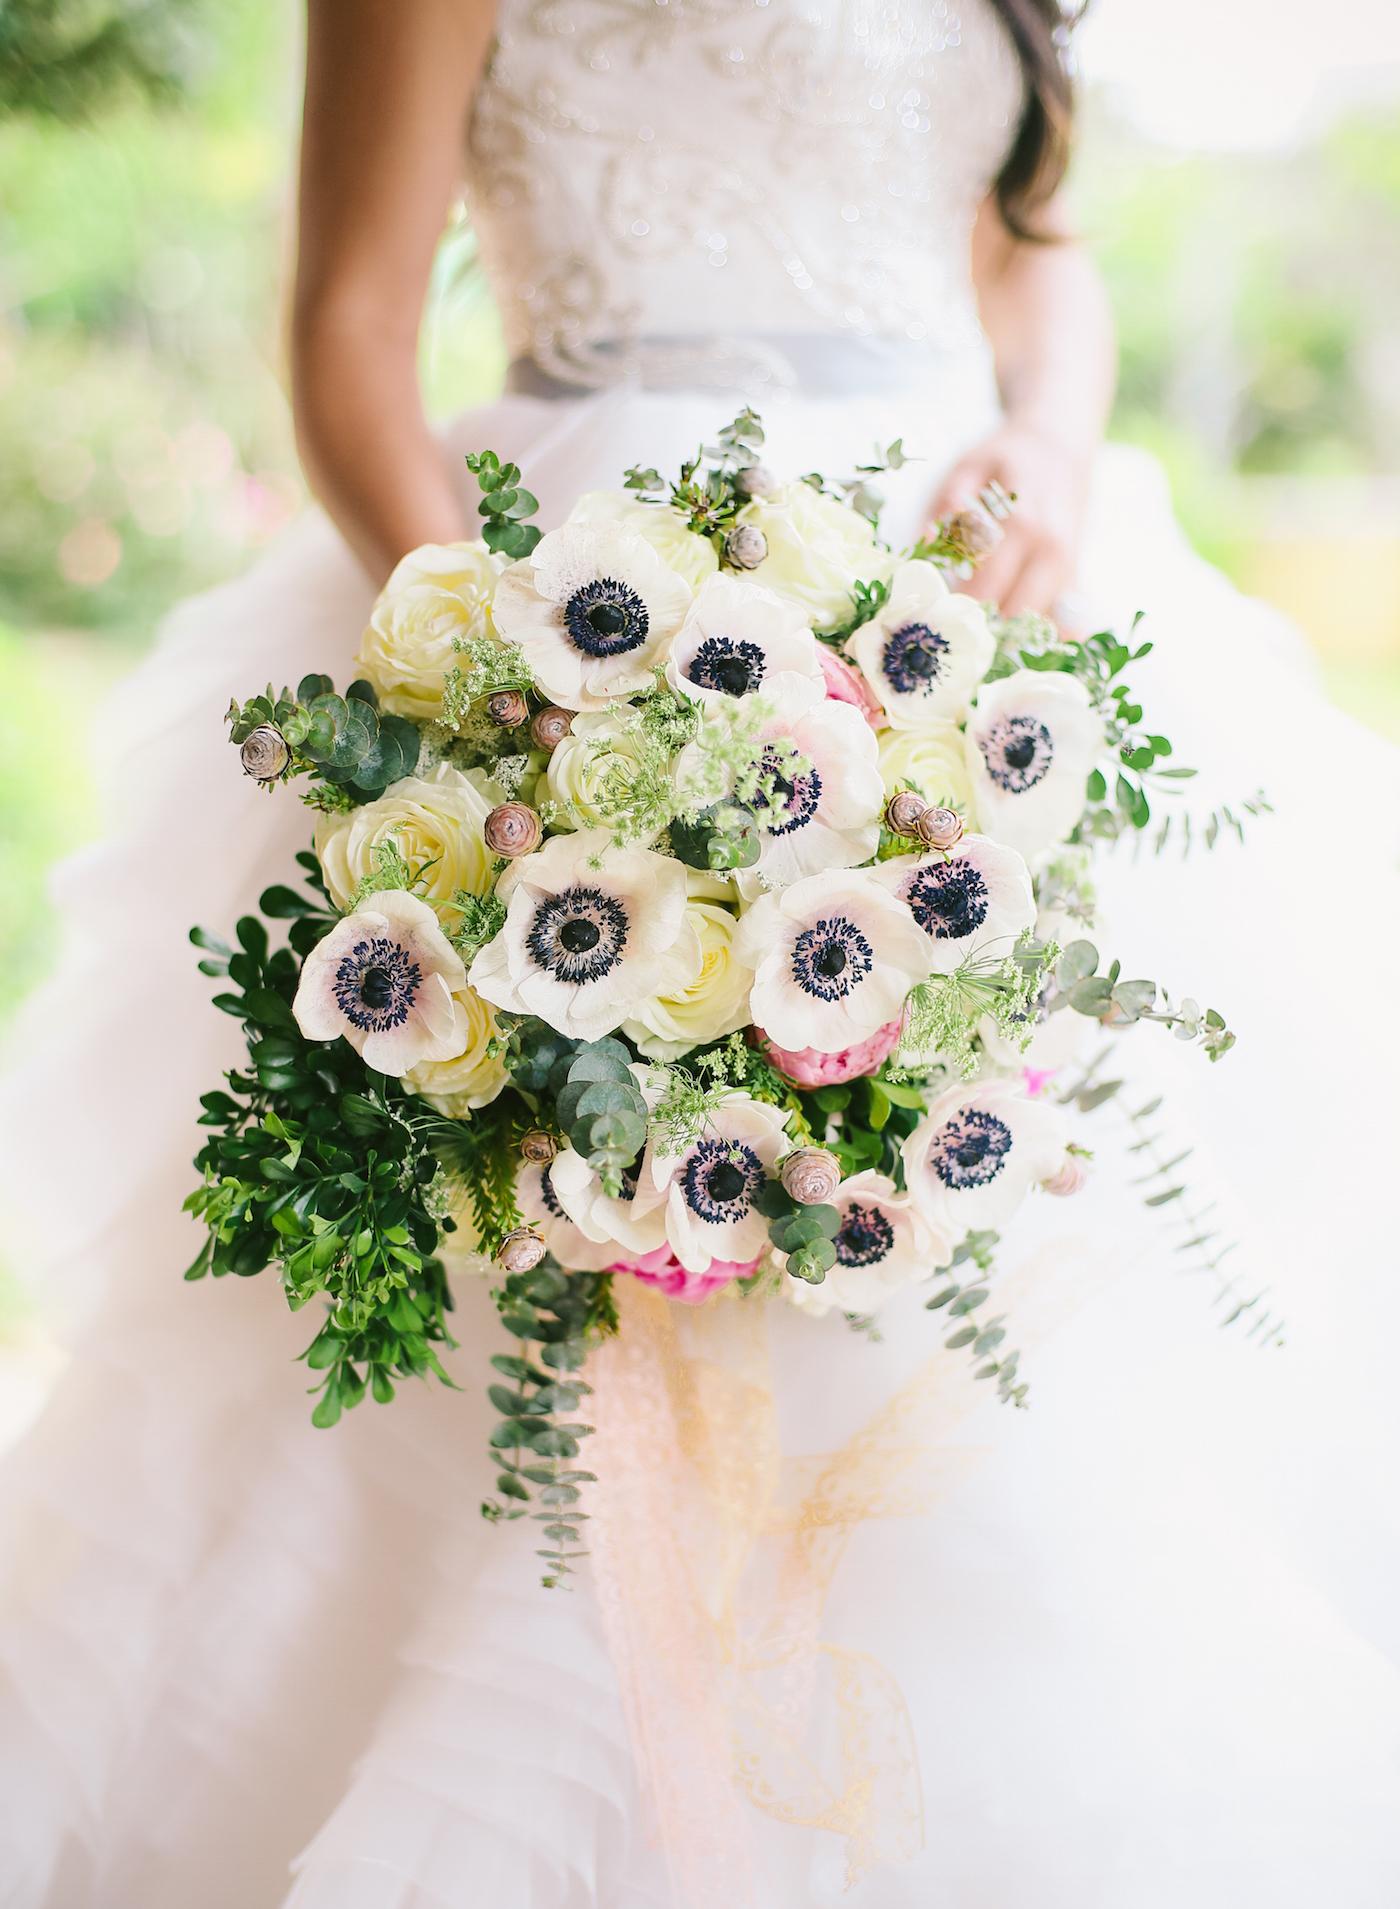 20 amazing wedding bouquets _jlucasreyes_vatelmanila